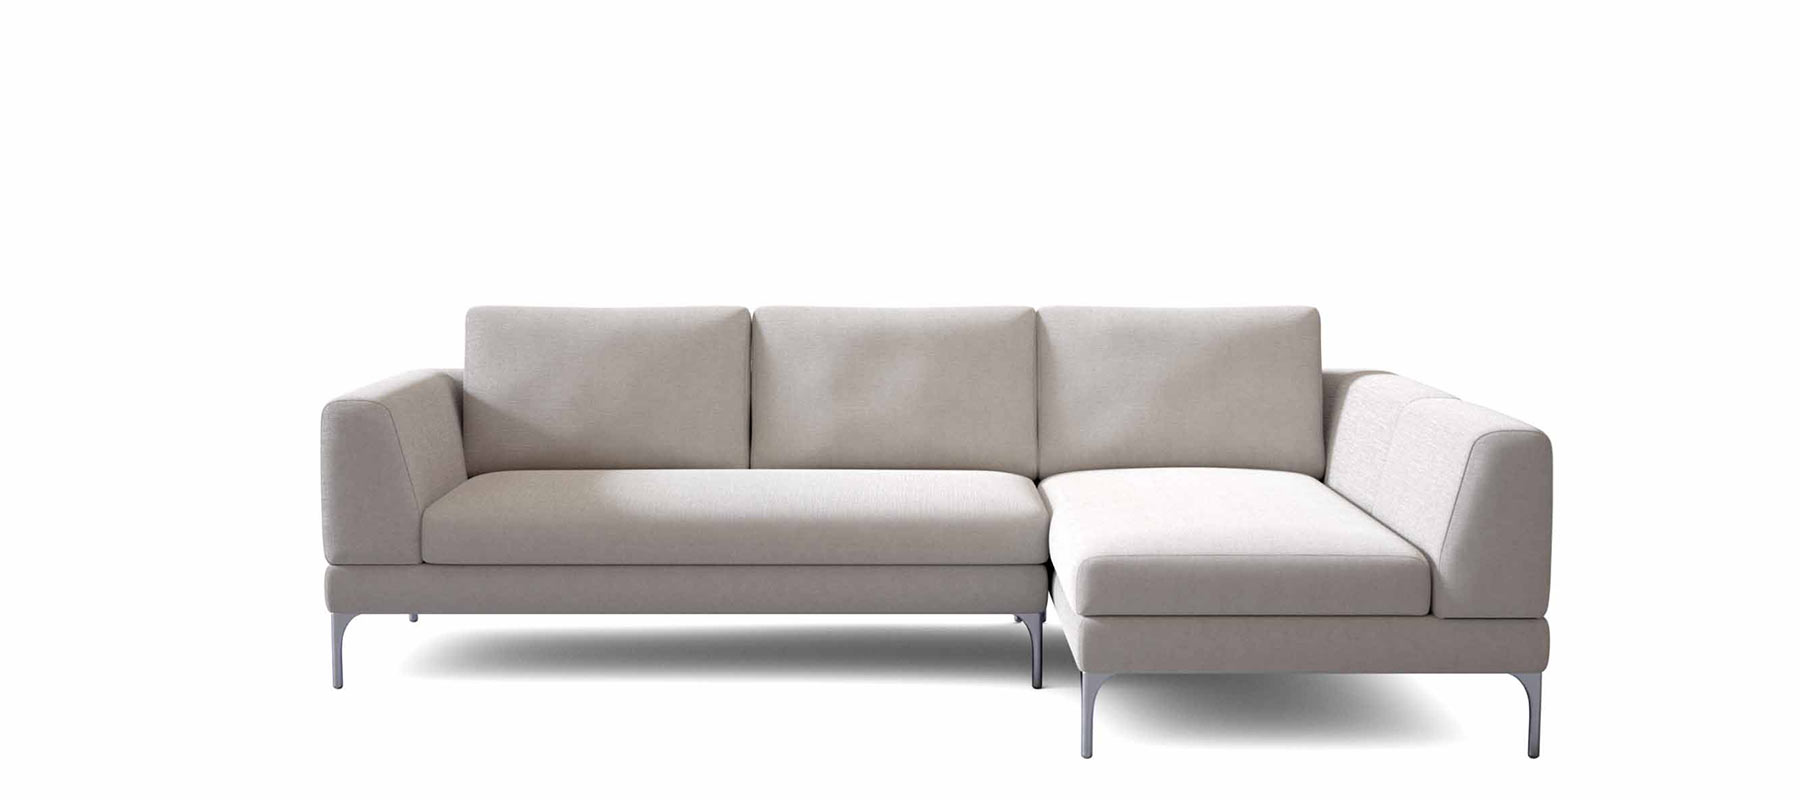 Plaza Modular Sofa Contemporary Design Lounge Couch